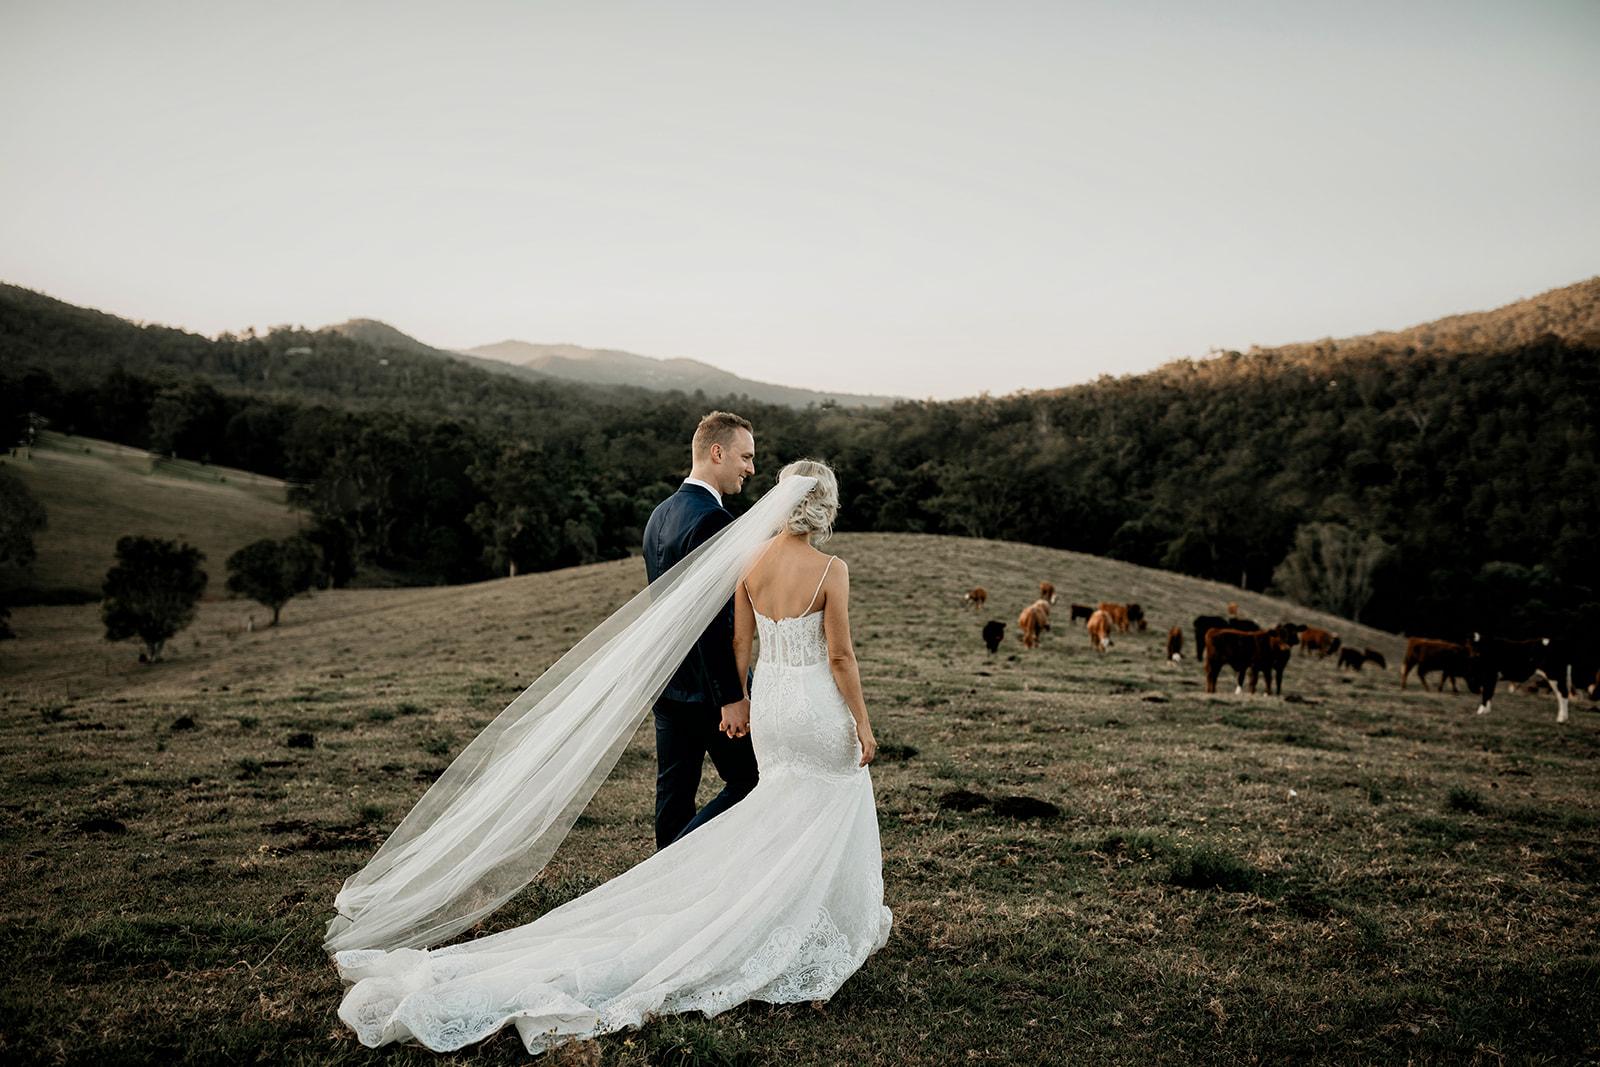 Gold_Coast_Hinterland_Barn_Wedding_Cowbell_Creek_Tanya5.jpg